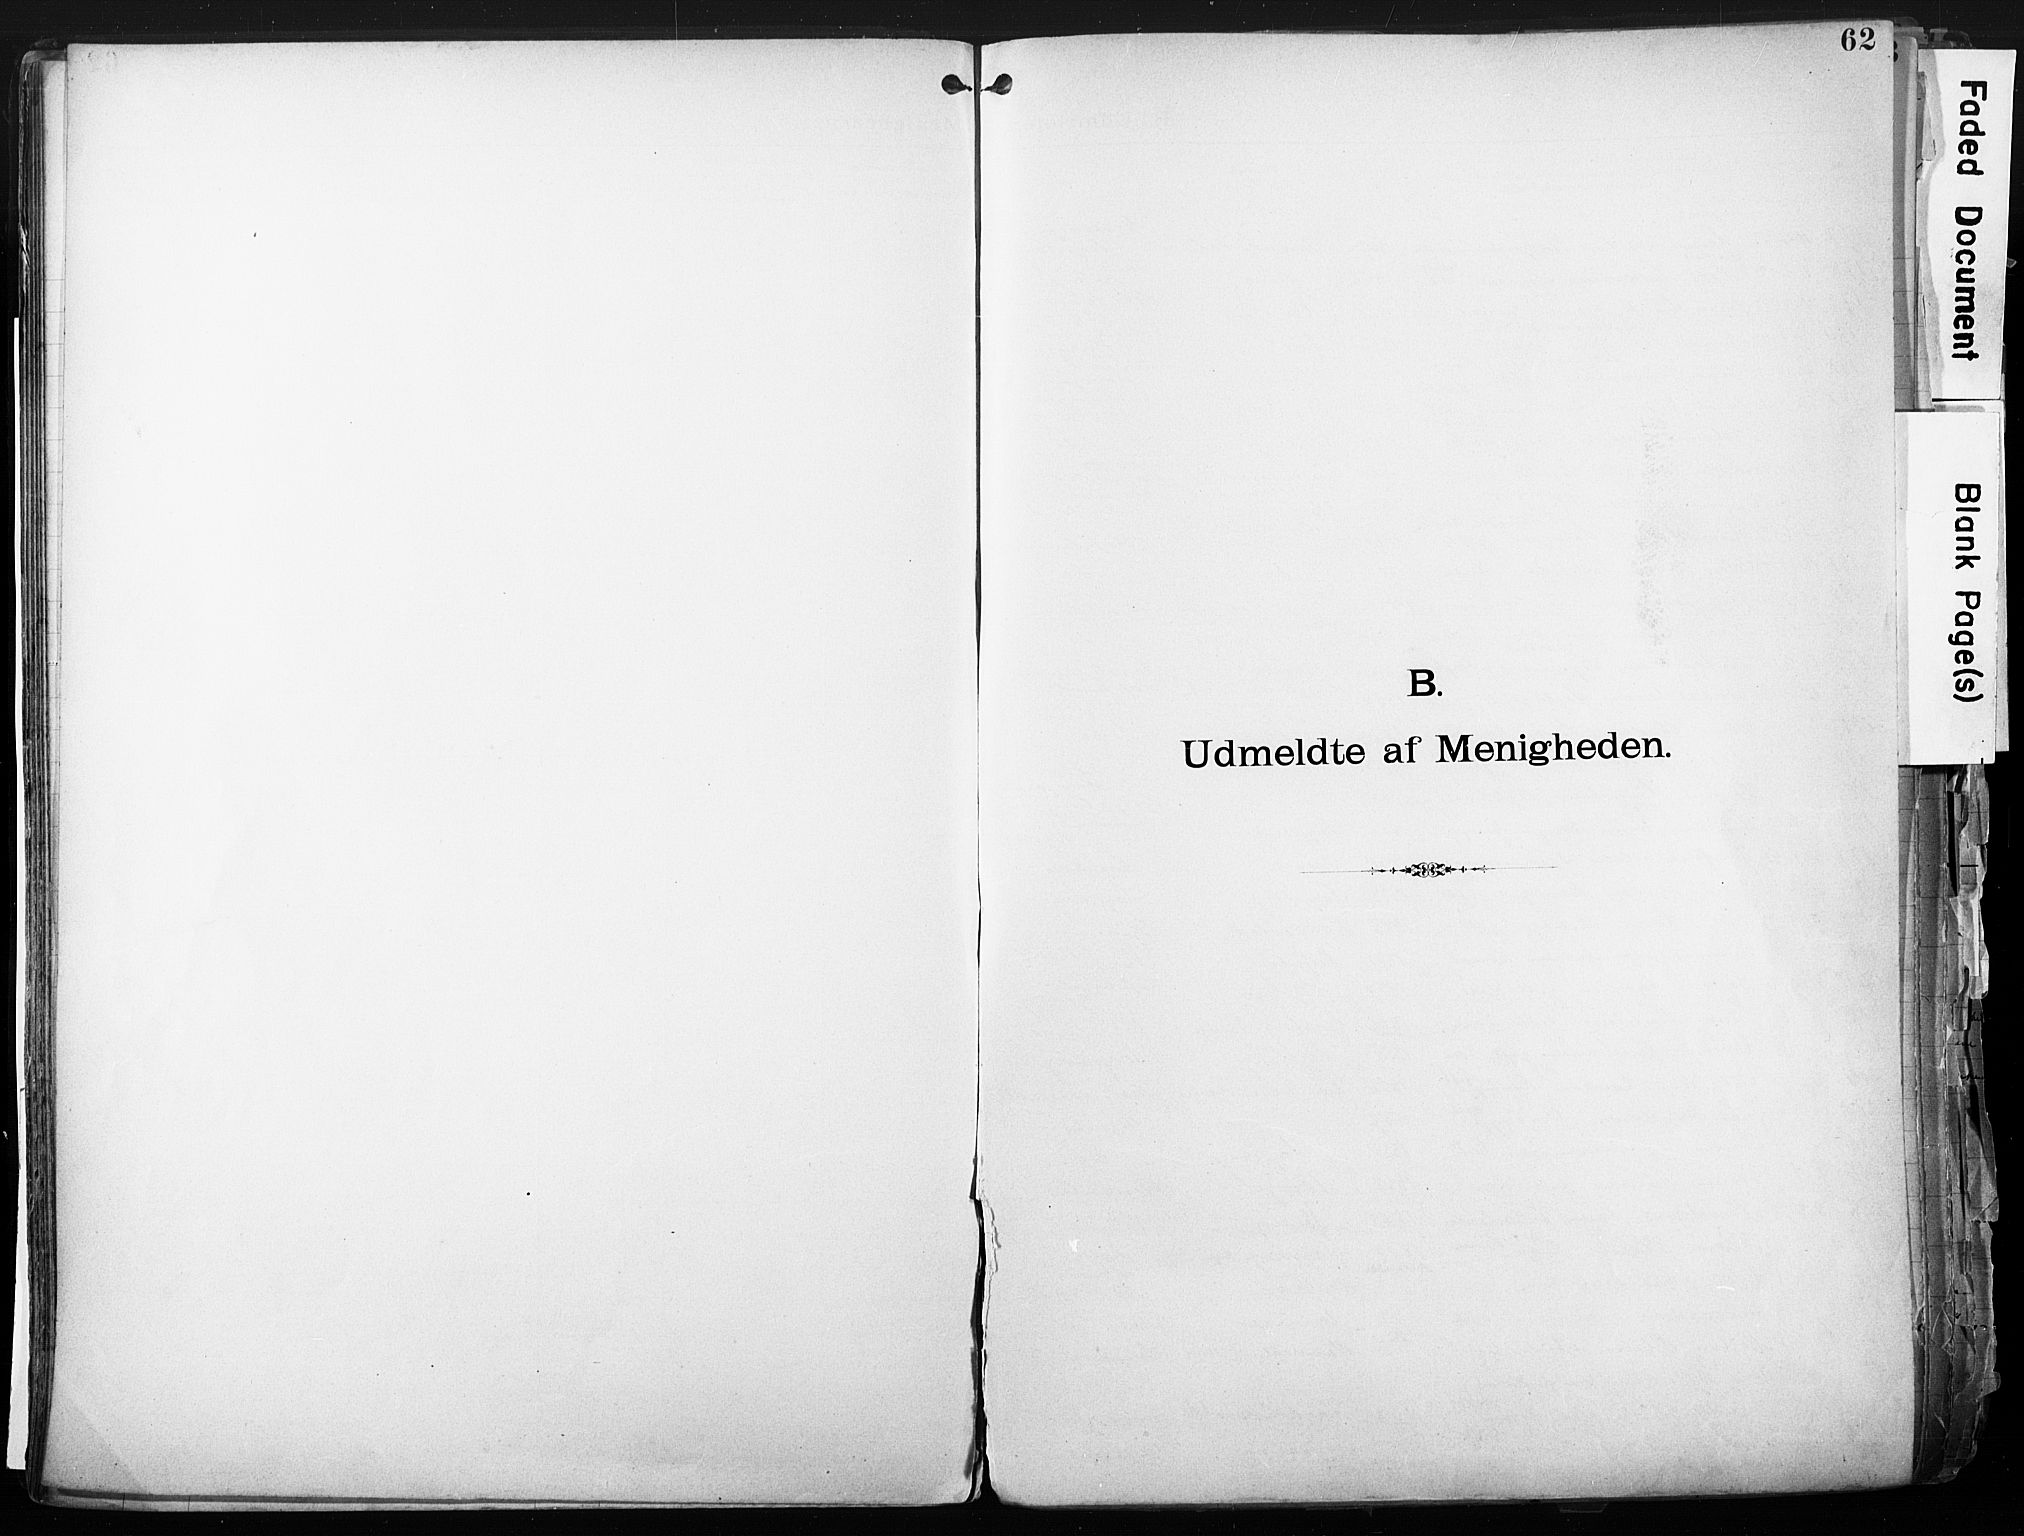 SAO, Sarpsborg metodistkirke, A/L0004: Dissenterprotokoll nr. 4, 1892-1923, s. 62